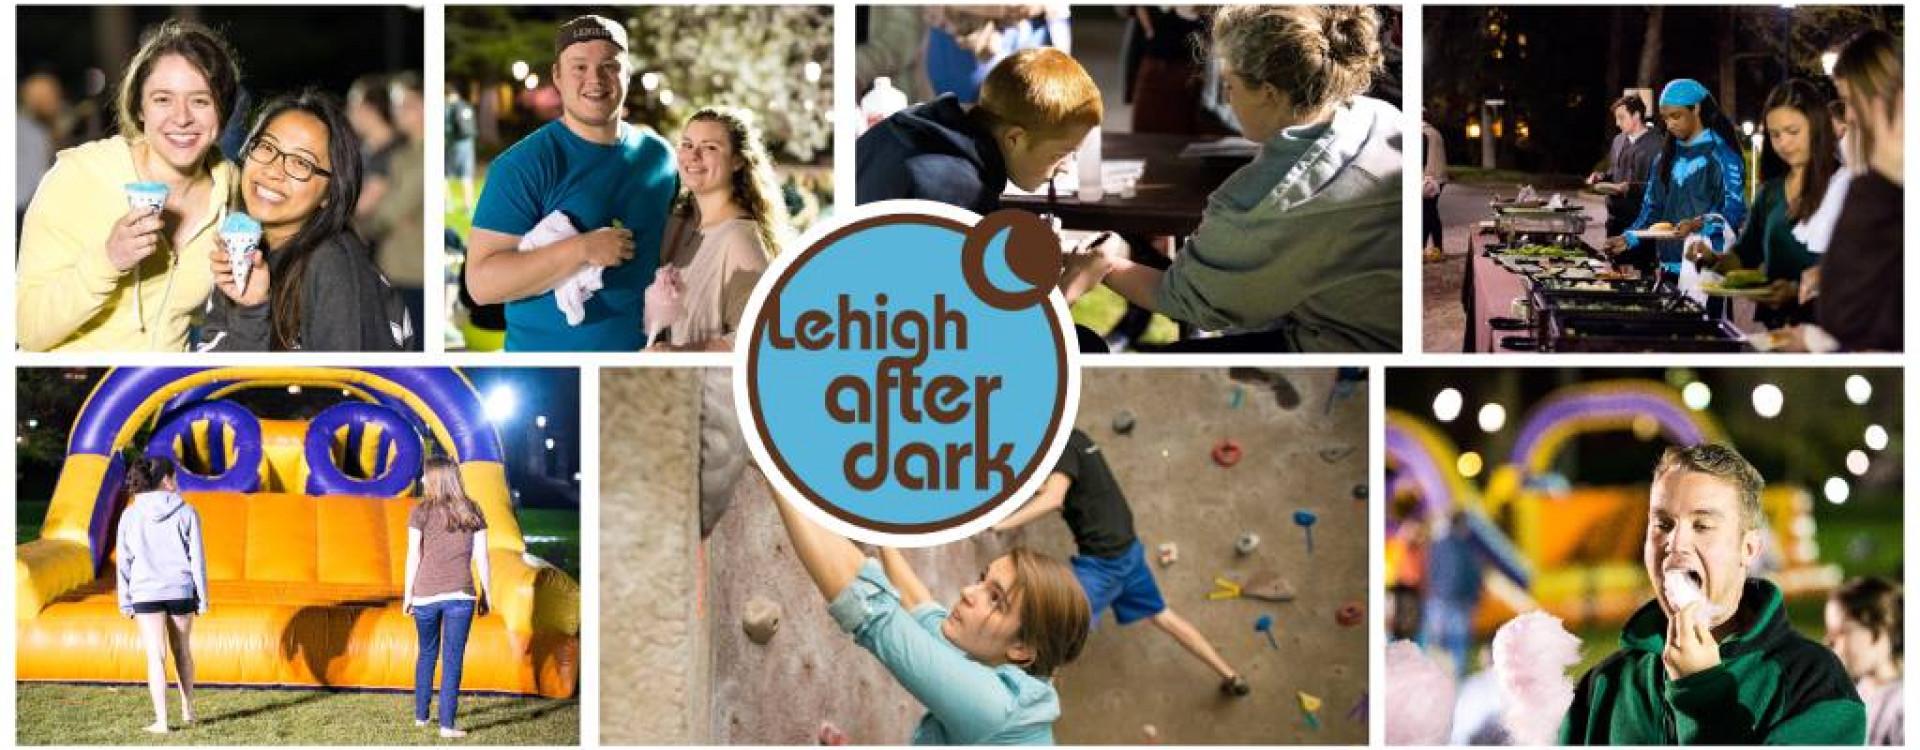 Lehigh After Dark banner with logo